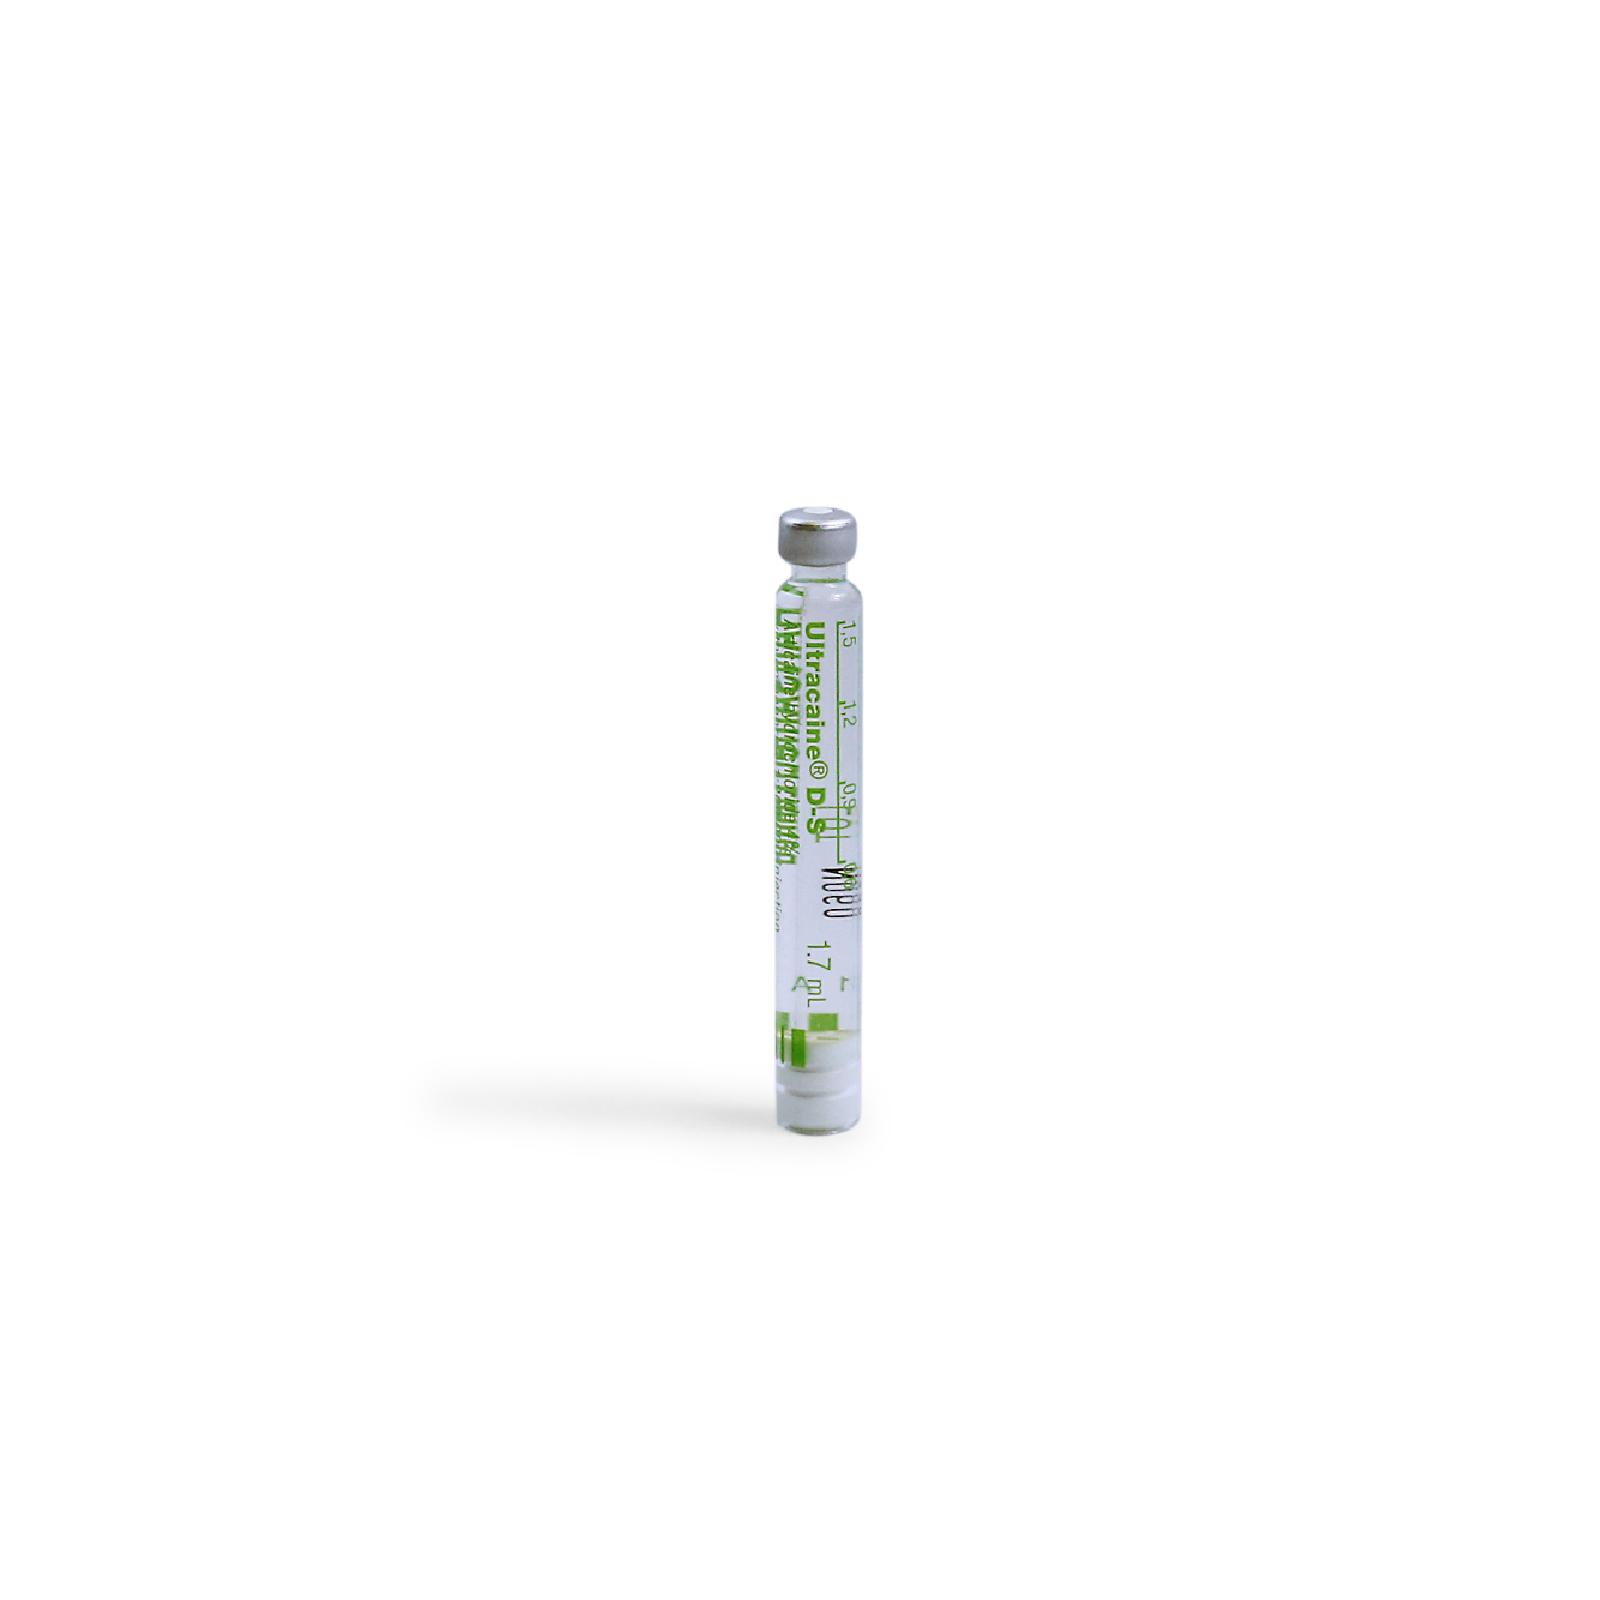 Picture of Ultracaine® D-S Regular Articaine HCI 4% w/ 1:200,000 Epi (Green), 100x1.7ml Carp/Bx